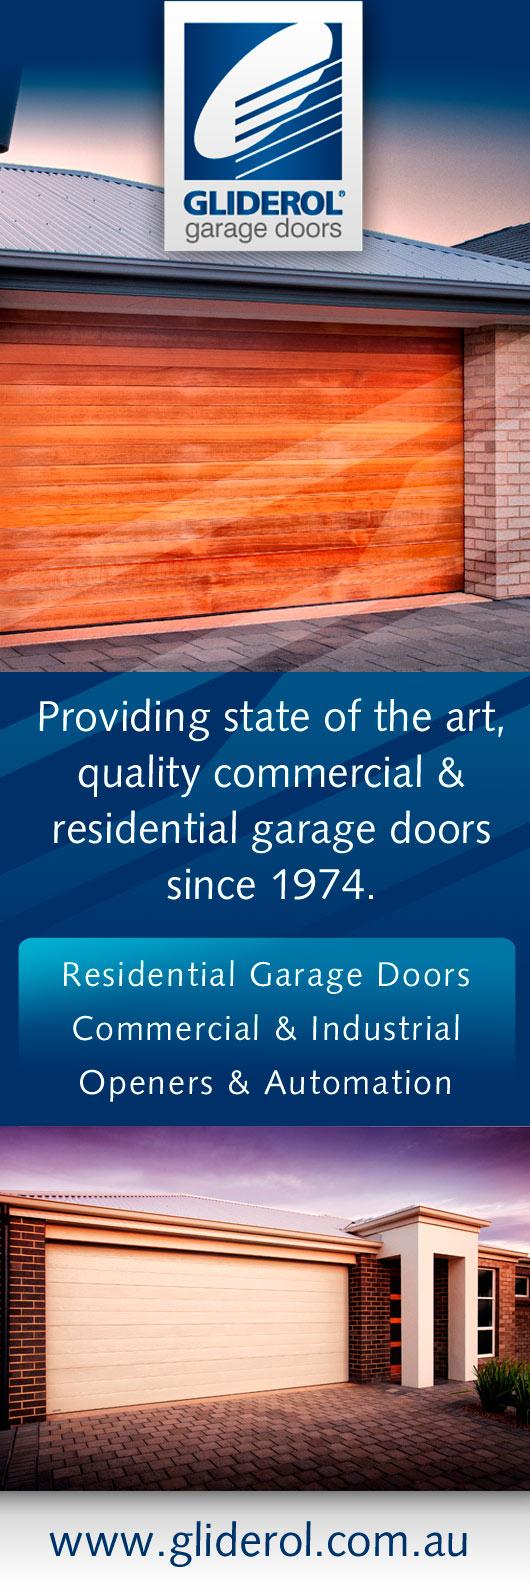 Gliderol Garage Doors - Promotion & Gliderol Garage Doors - Garage Doors \u0026 Fittings - GOSFORD